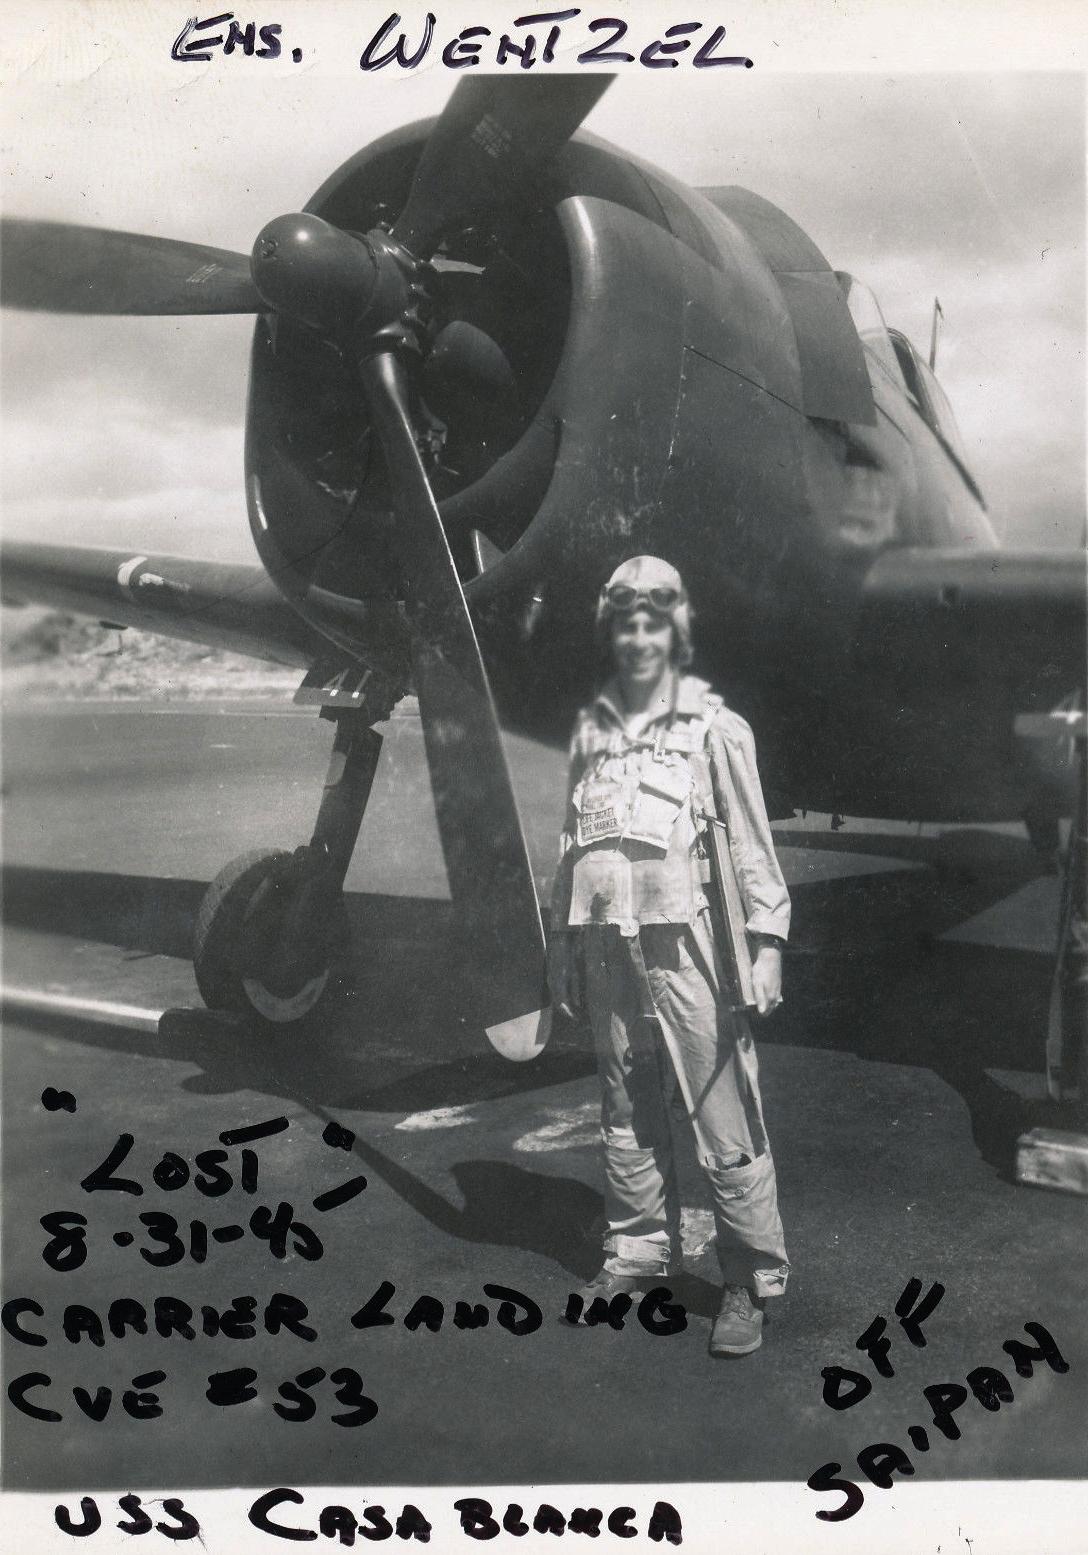 Aircrew USN VBF 8 Ens William Everett Wentzel KIA 31st Aug 1945 carquals CVE 53 USS Casablanca off Saipan F6F 5 BuNo 72016 01